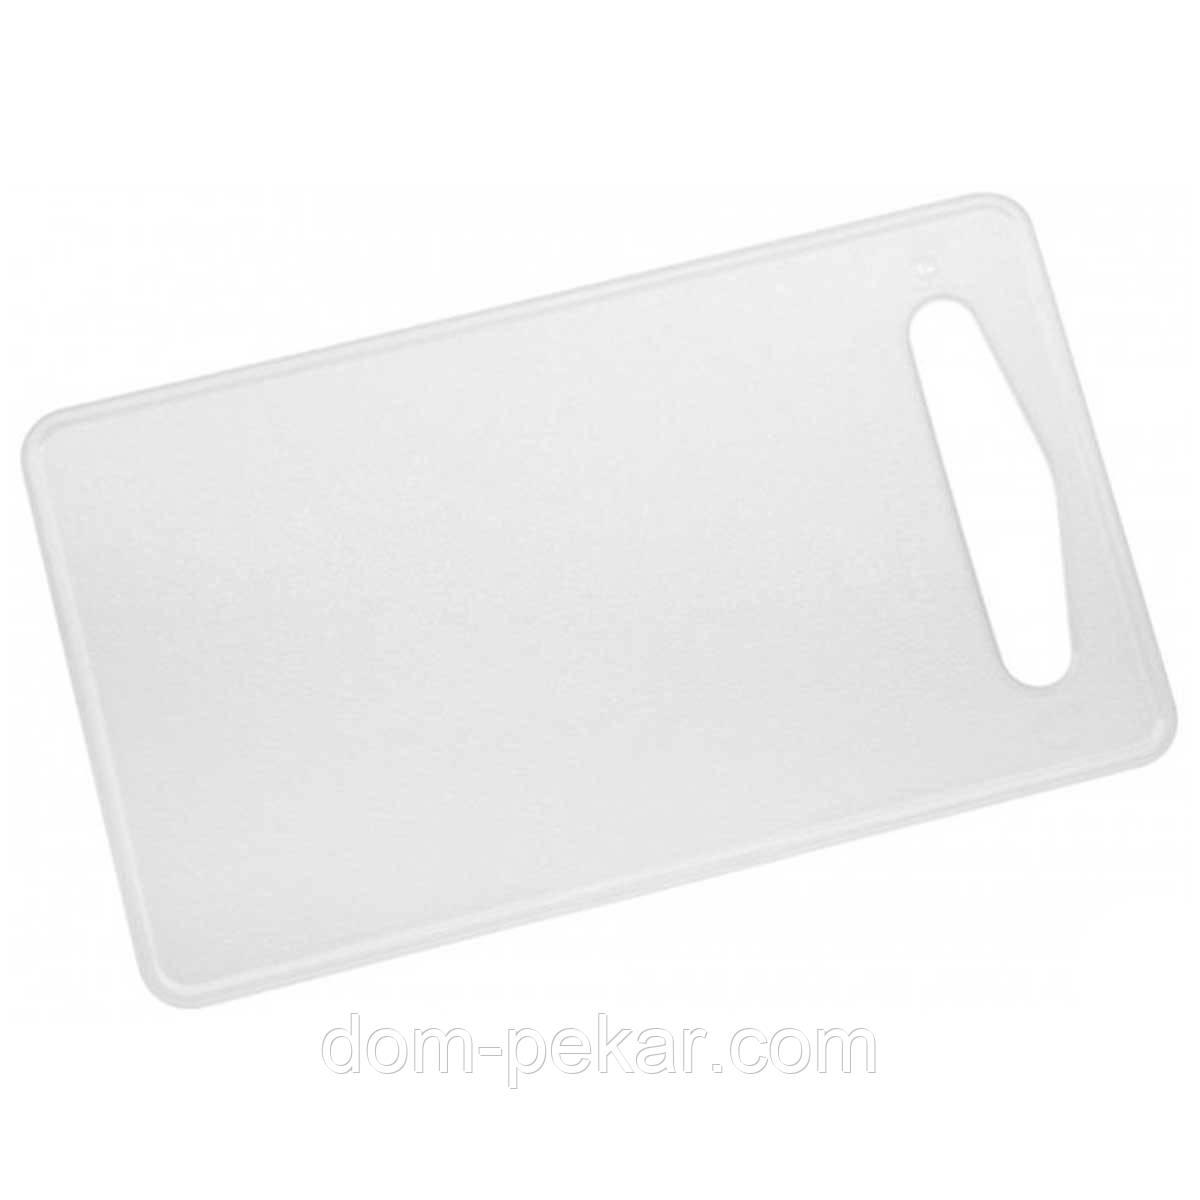 Доска разделочная пластик 37*24*0,5 см